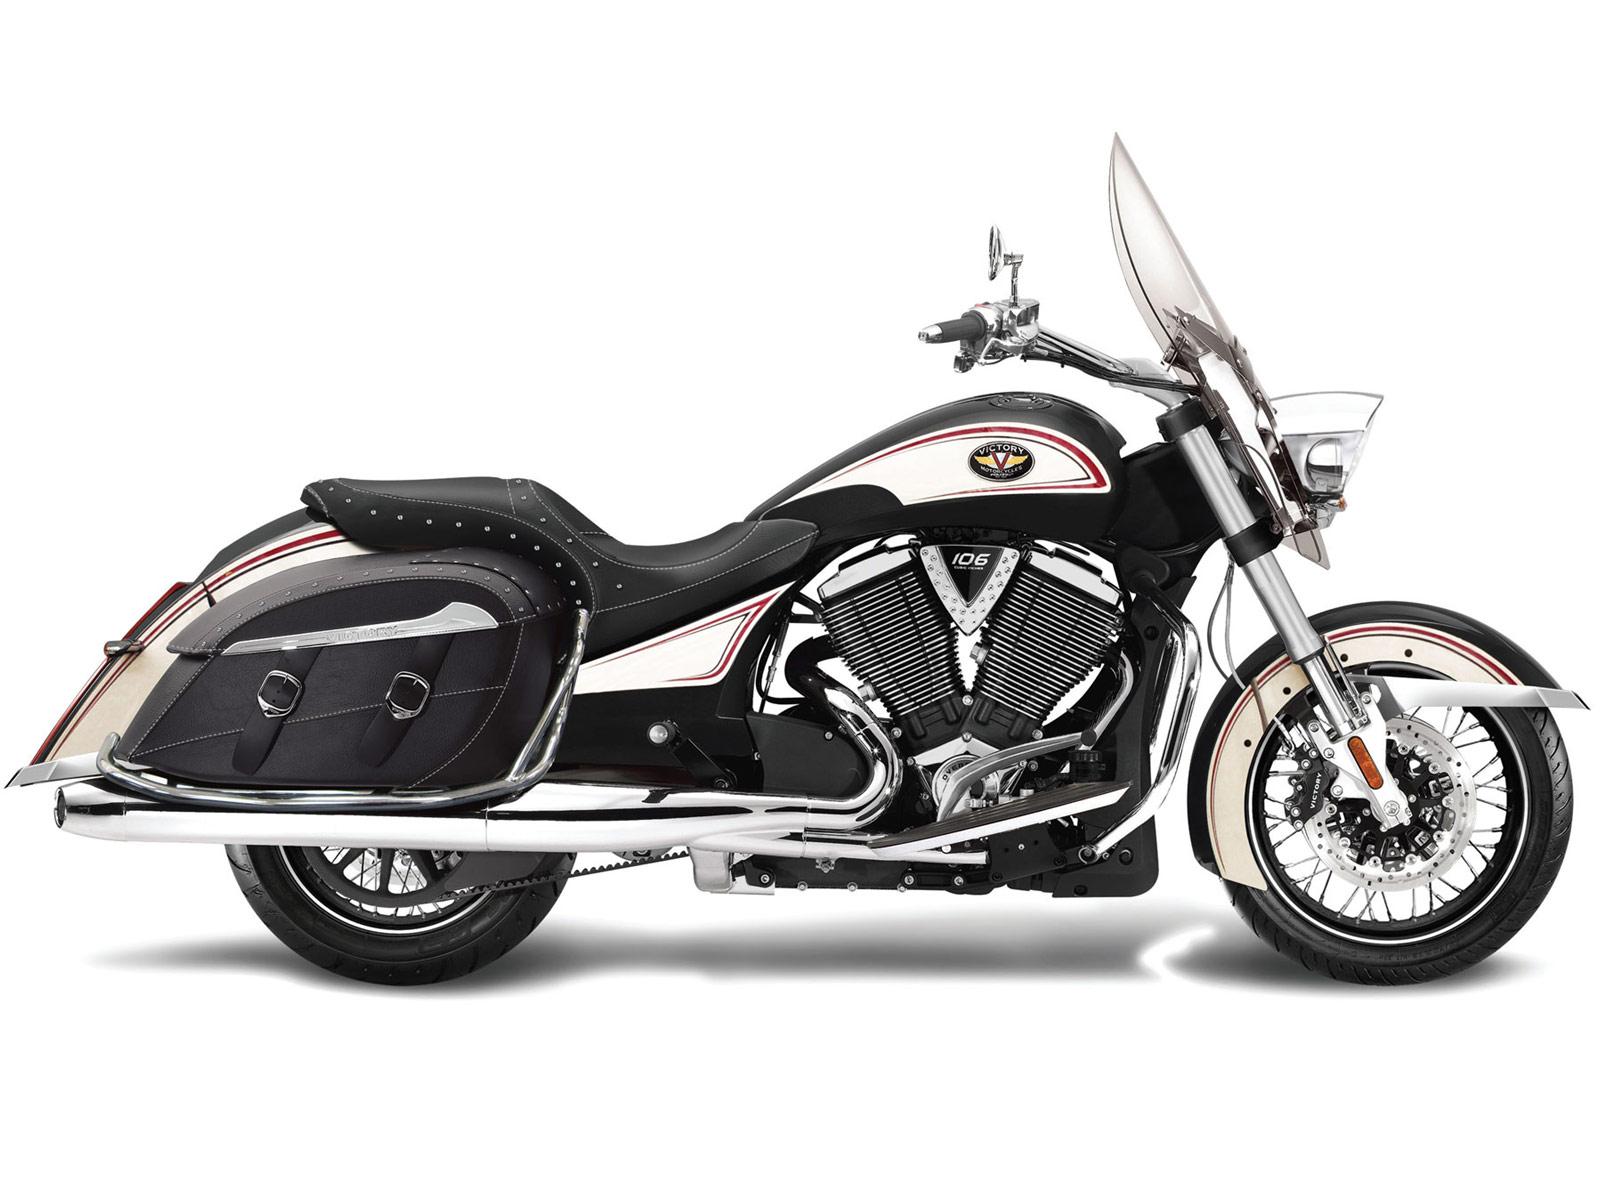 2012 Victory Cross Roads Classic LE motorcycle desktop wallpapersjpg 1600x1200